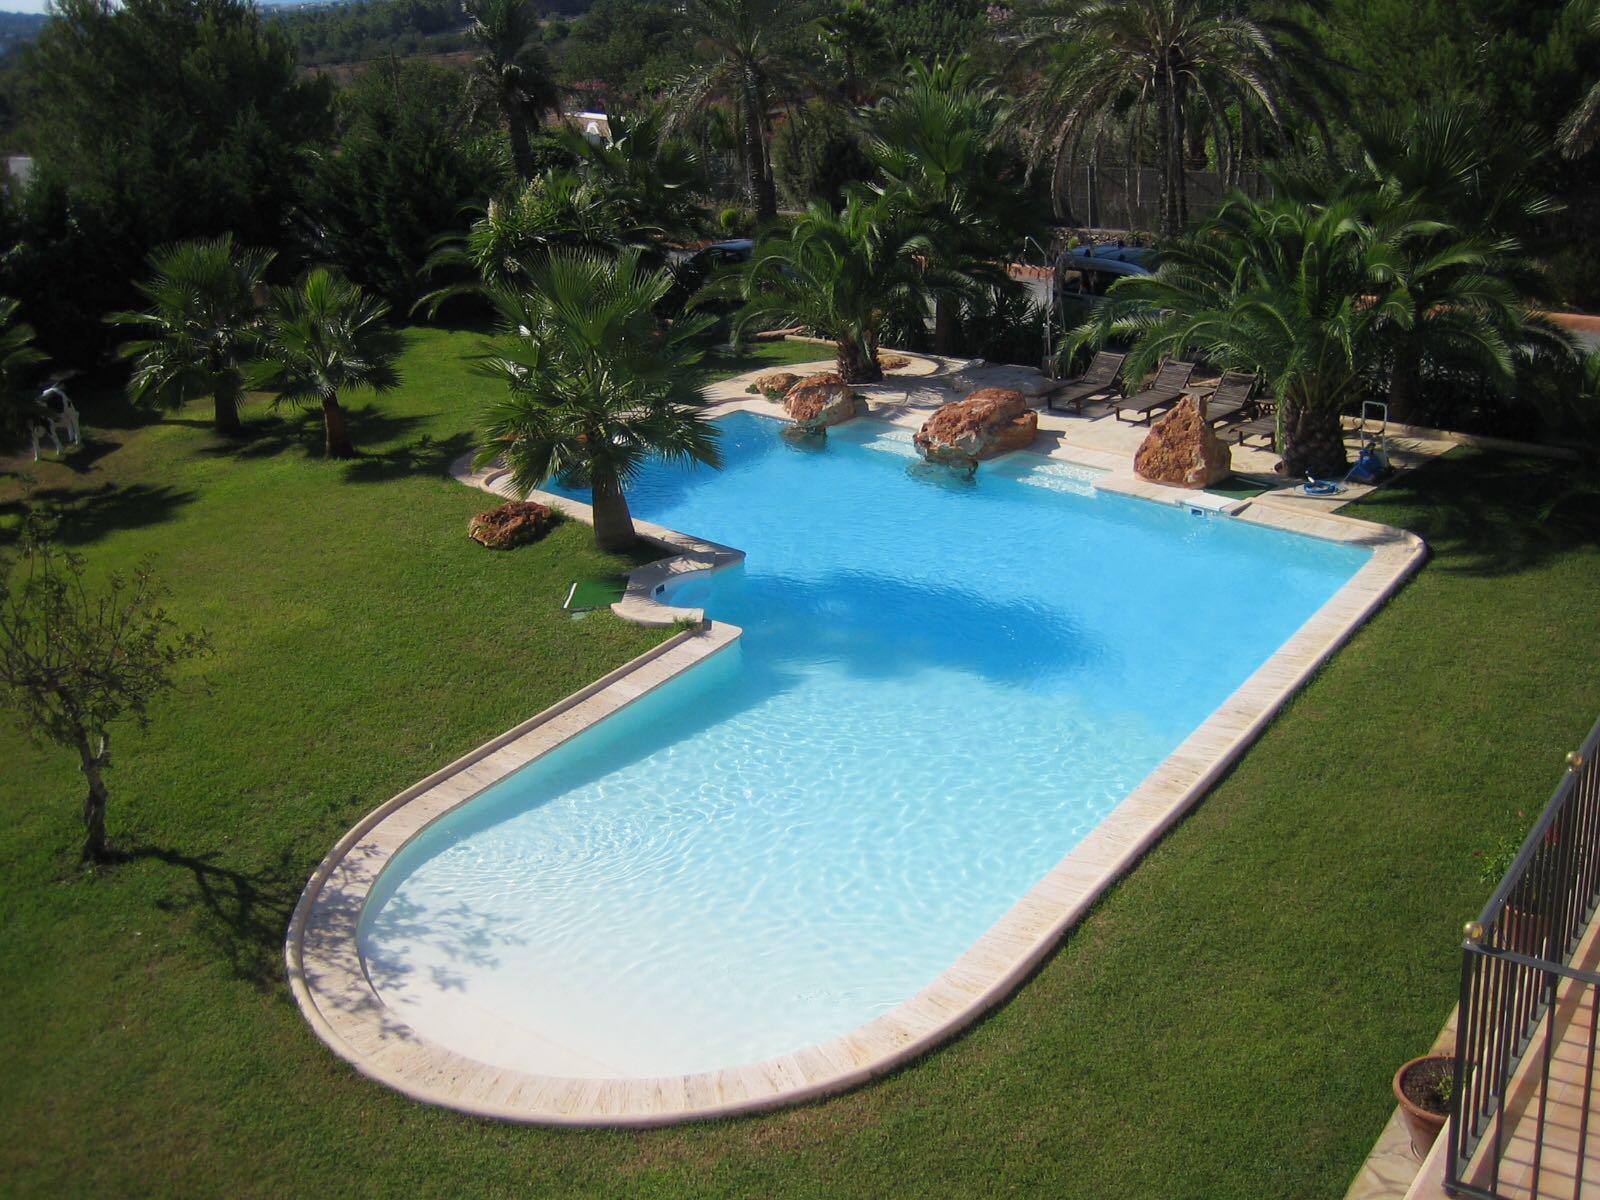 Piscina de playa - piscinas Zaragoza